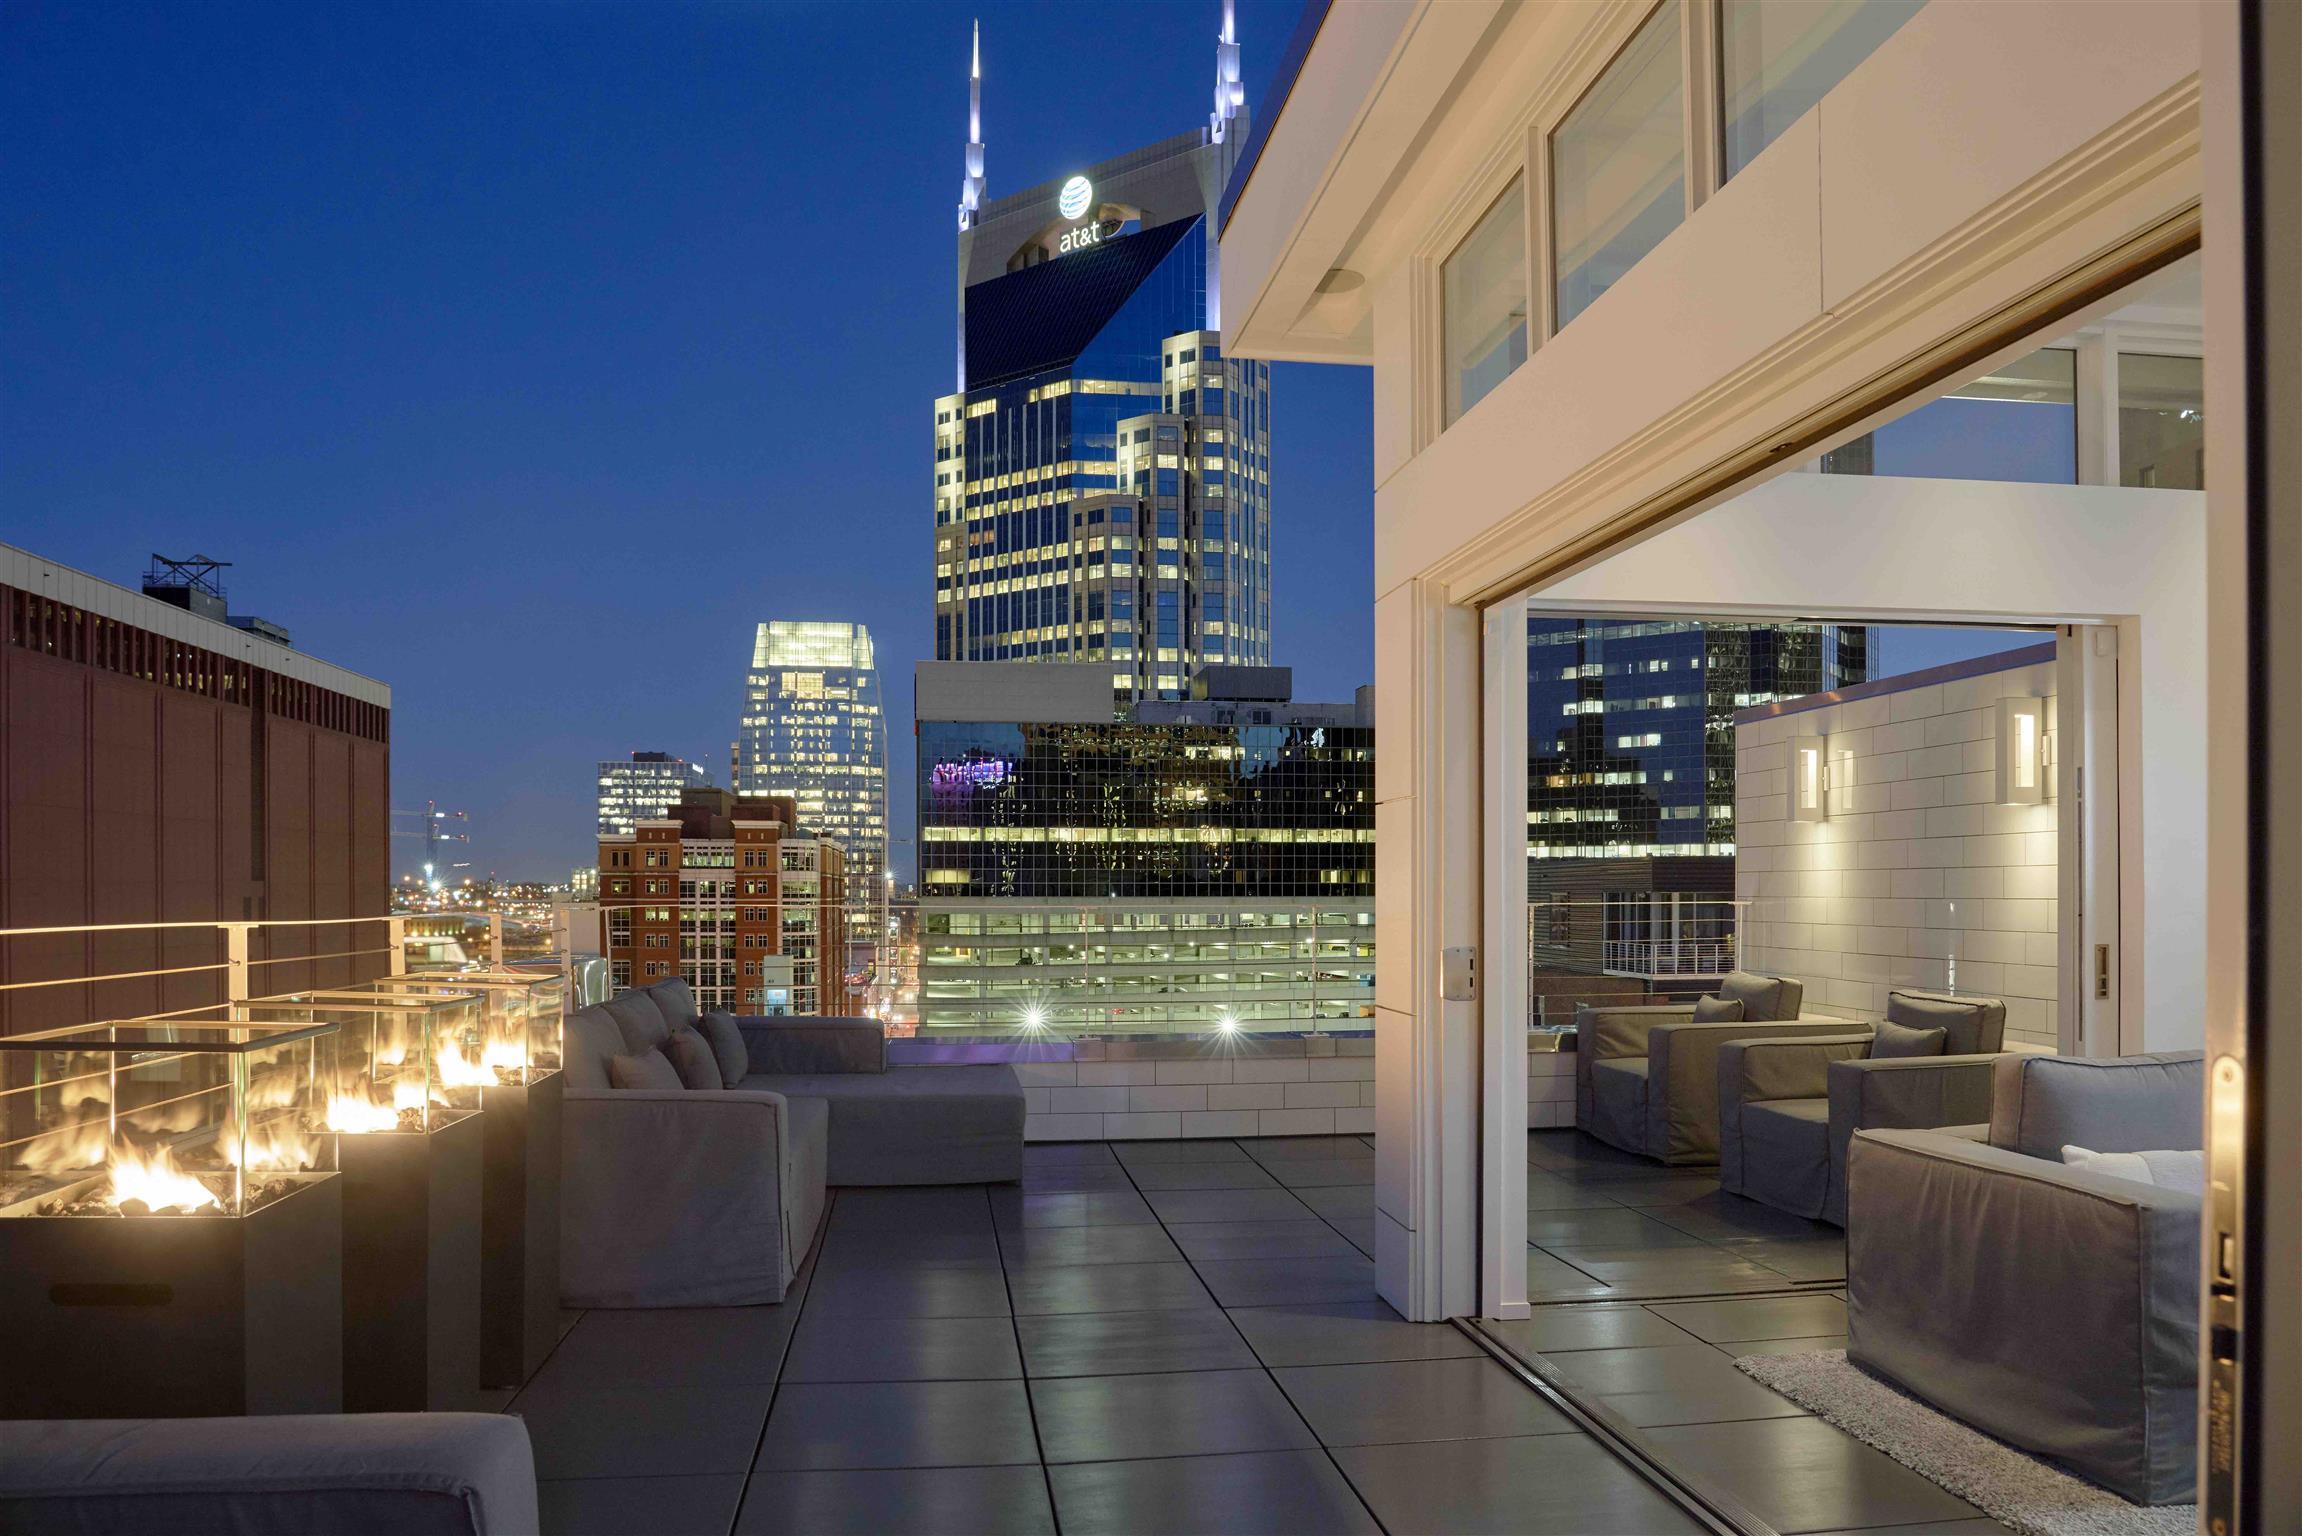 207 3rd Ave N Unit 601, Nashville, TN 37201 - Nashville, TN real estate listing